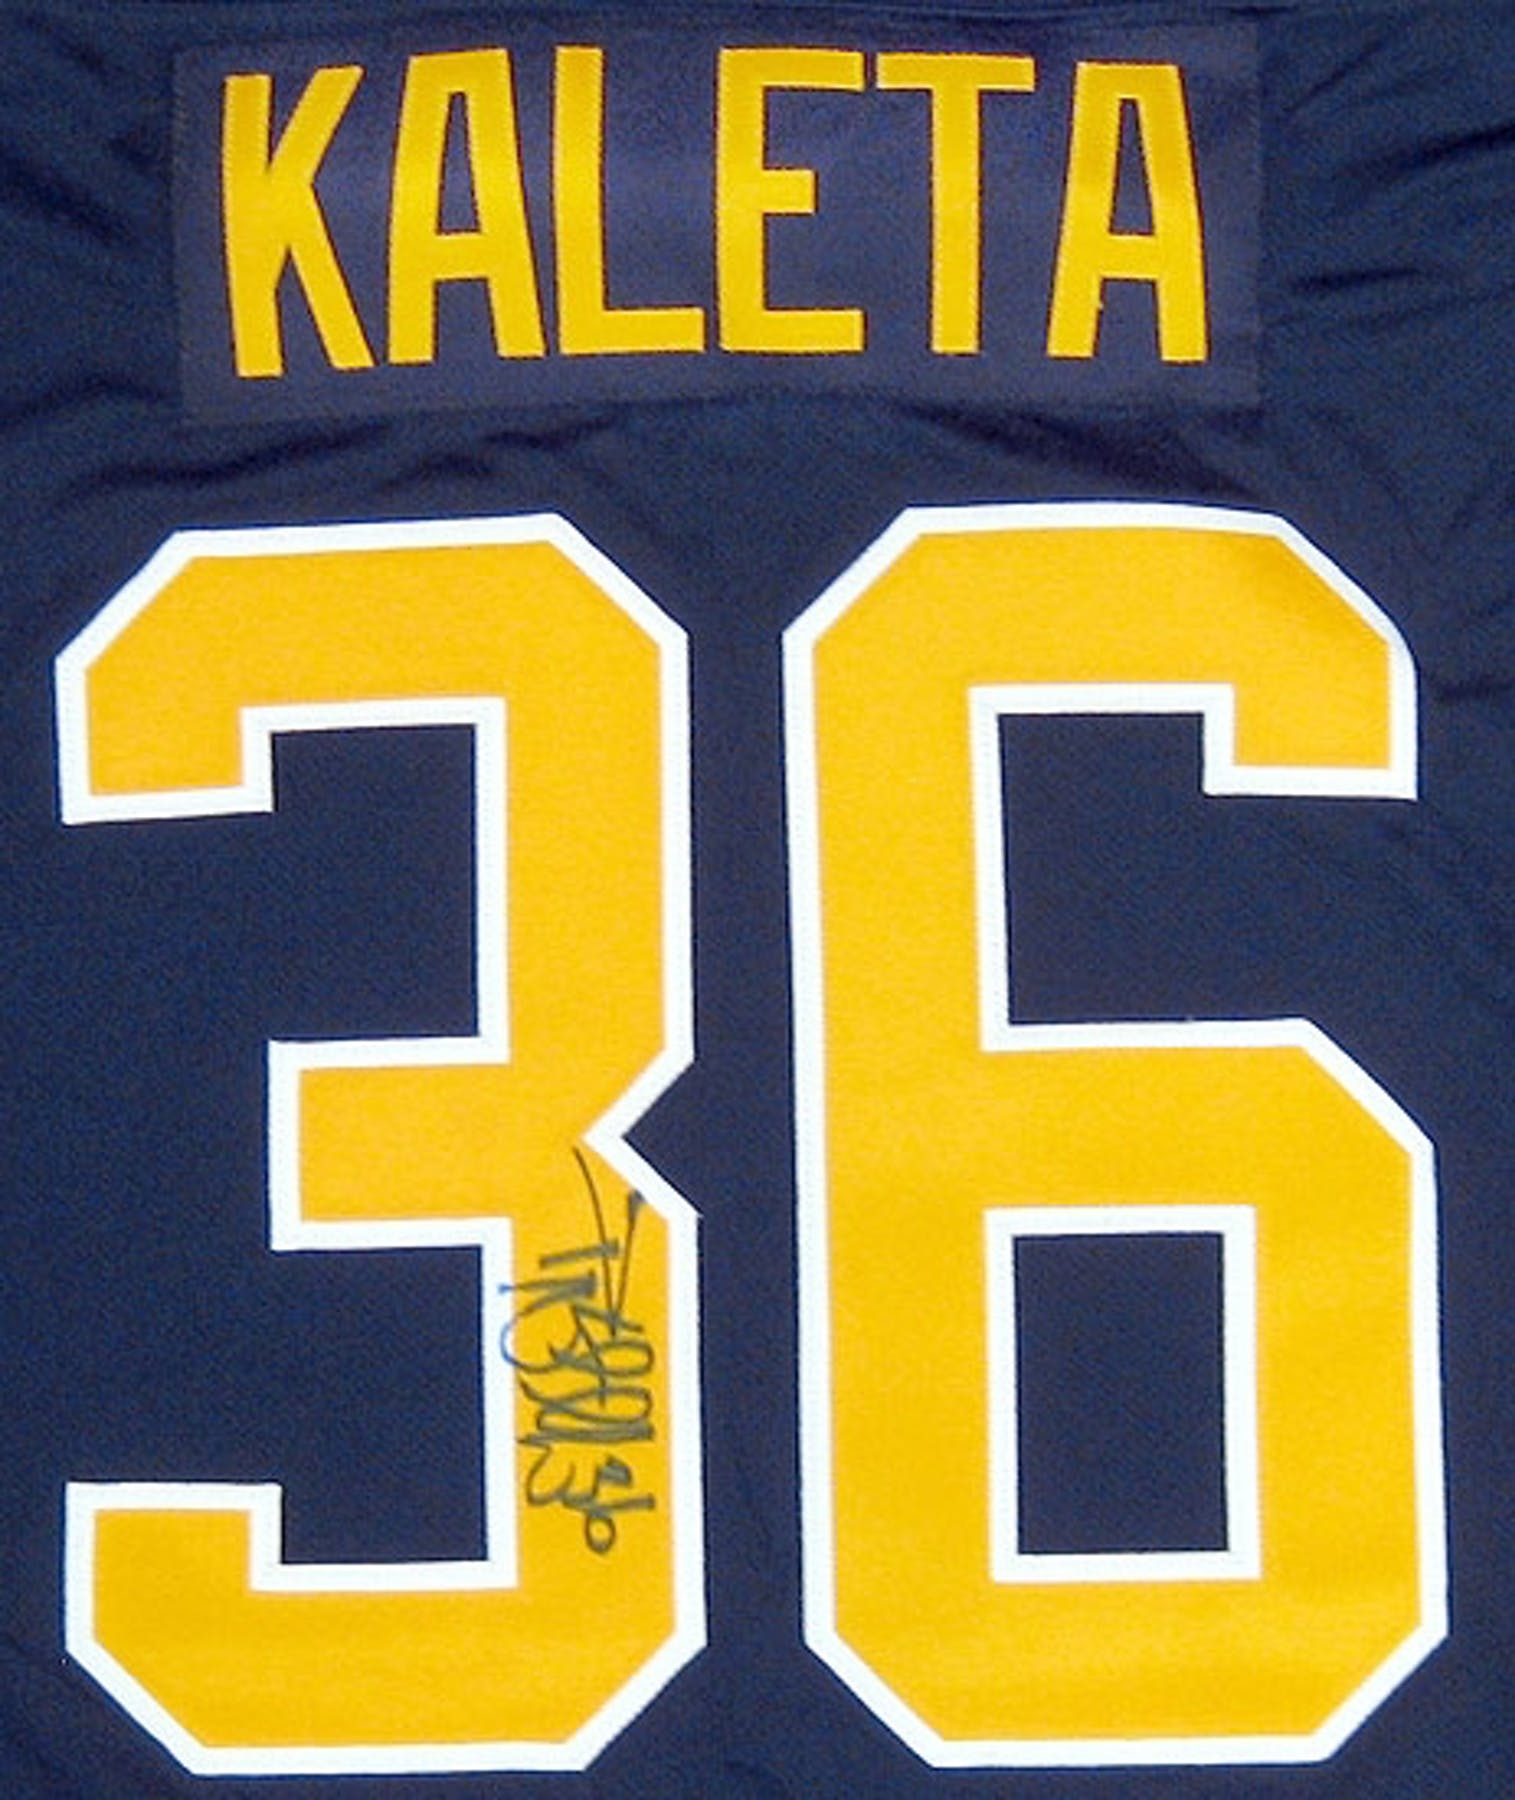 ef9290439 Patrick Kaleta Autographed Buffalo Sabres Blue Hockey Jersey